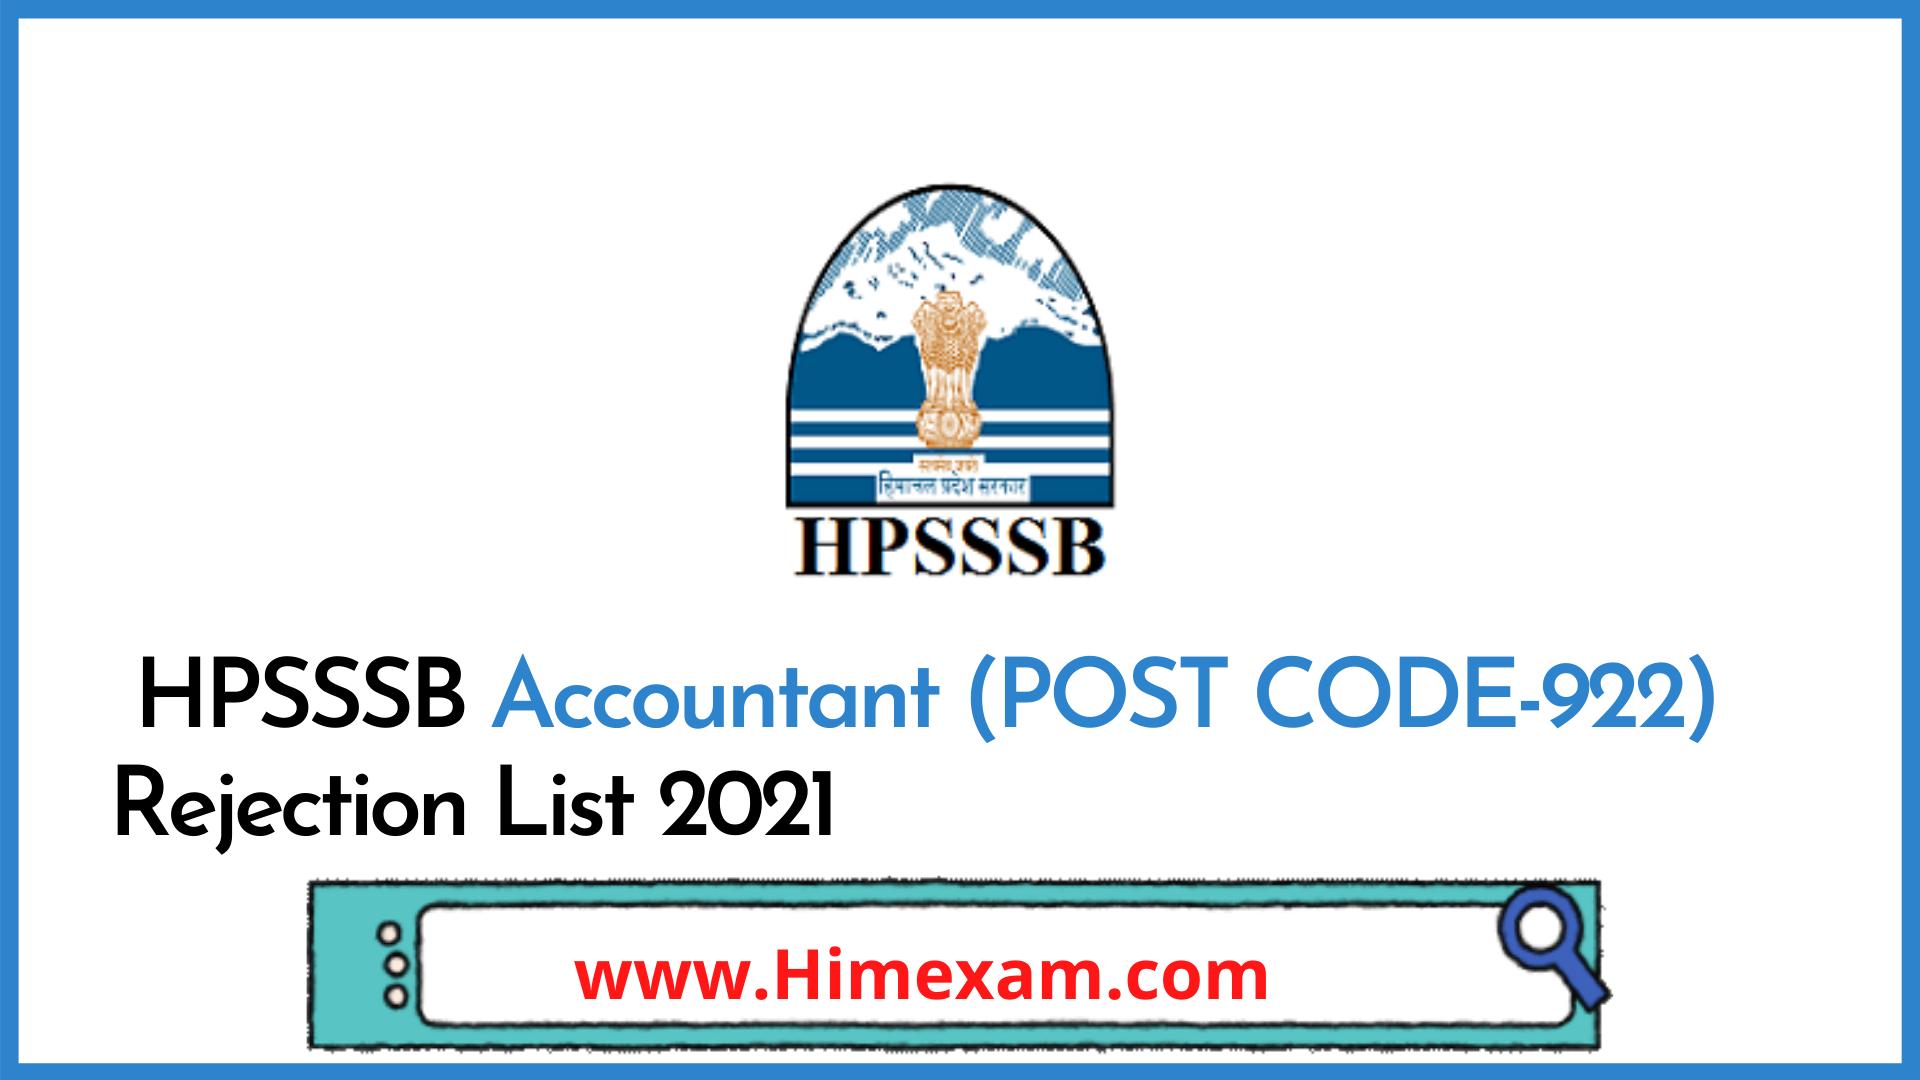 HPSSSB Accountant (POST CODE-922) Rejection List 2021